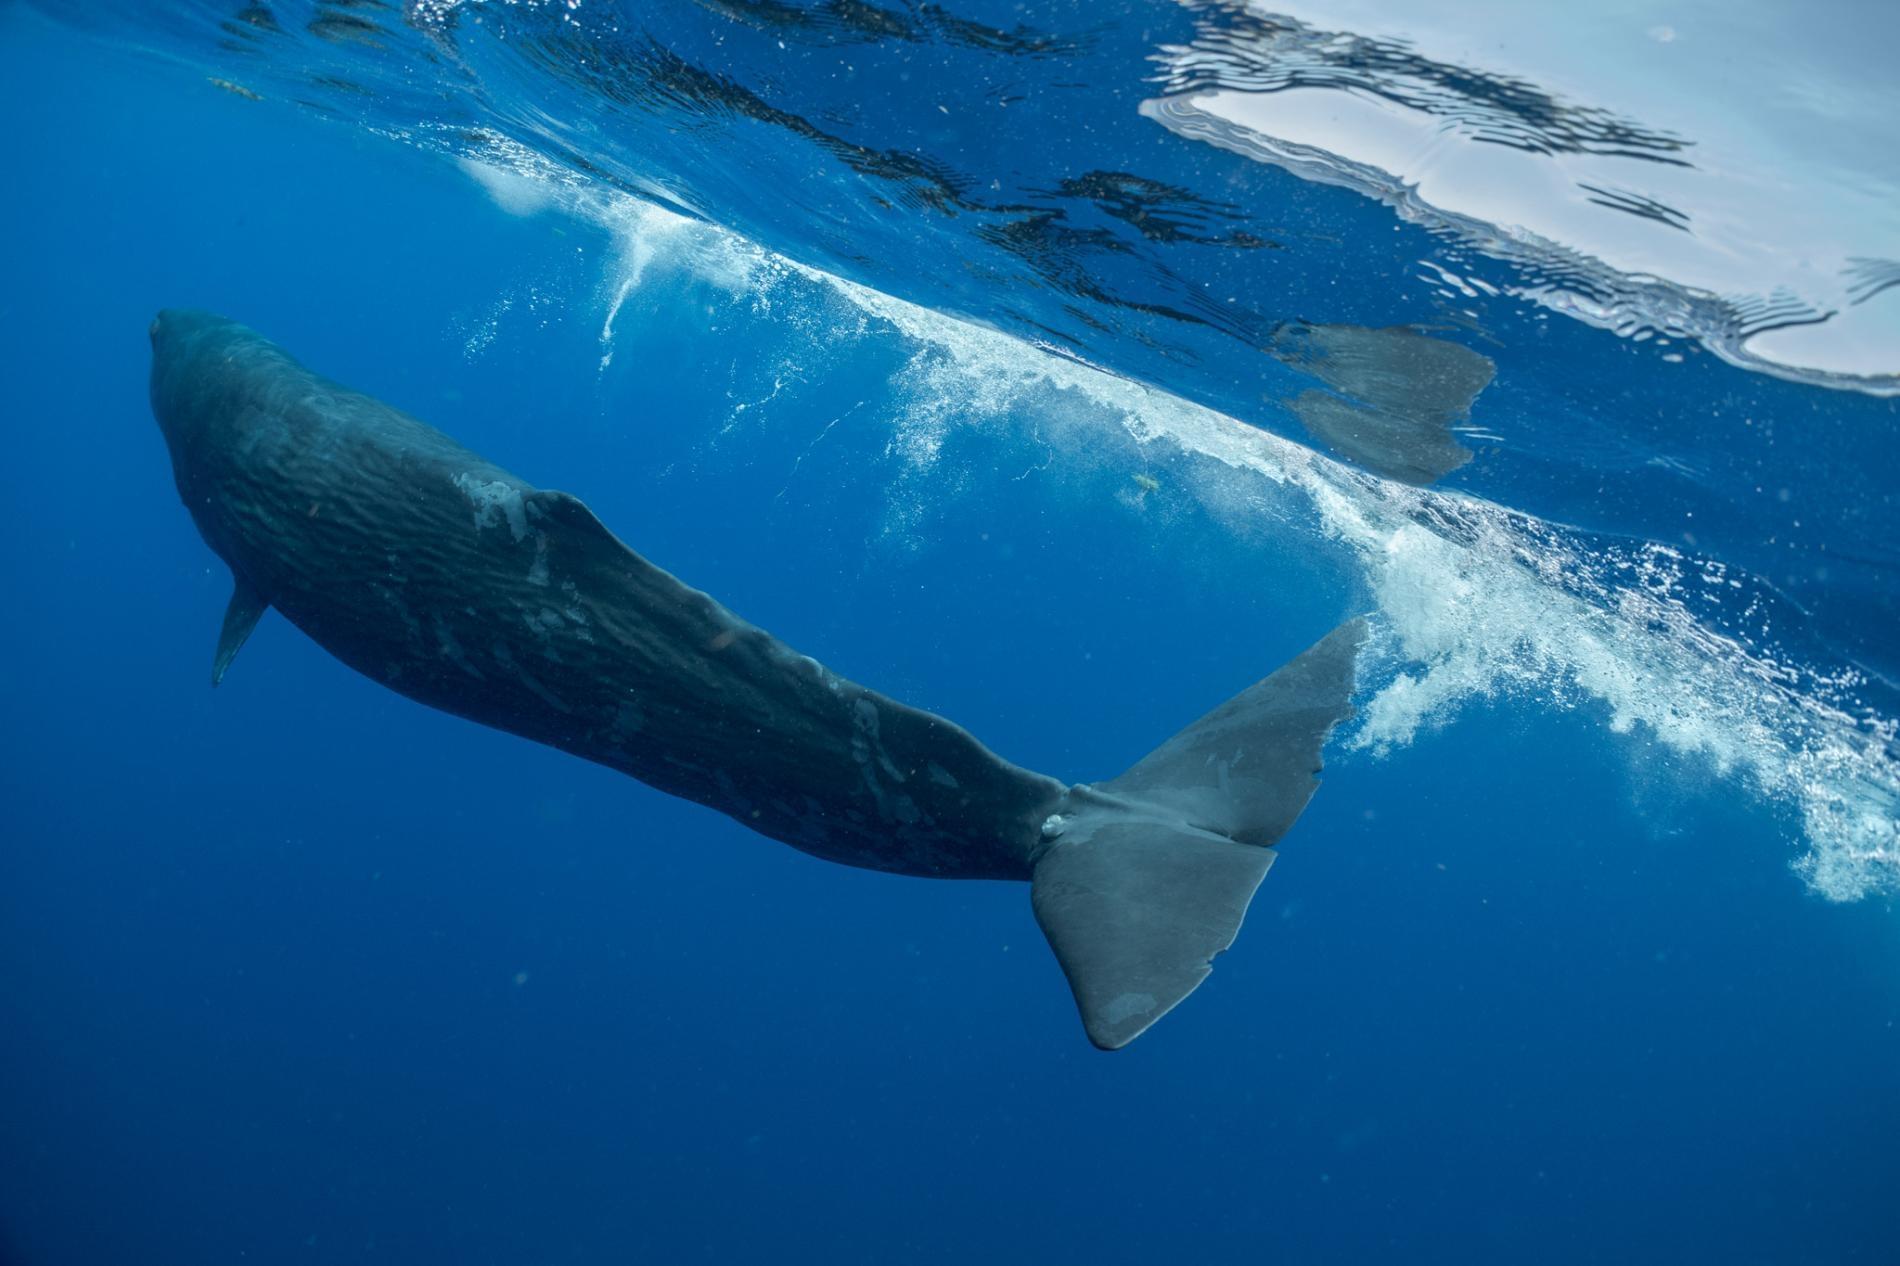 PHOTOGRAPH BY BRIAN SKERRY指頭(Digit)是一頭年輕的雌性抹香鯨,生活在加勒比海國家多米尼克附近。牠的尾鰭基部曾被一條致命的捕魚繩纏住三年,後來抹香鯨科學家謝恩.葛洛(Shane Gero)於2018年發現牠又能自在游泳。指頭的困境有助於激勵葛洛更努力工作,以確保人類與鯨魚和平共處。